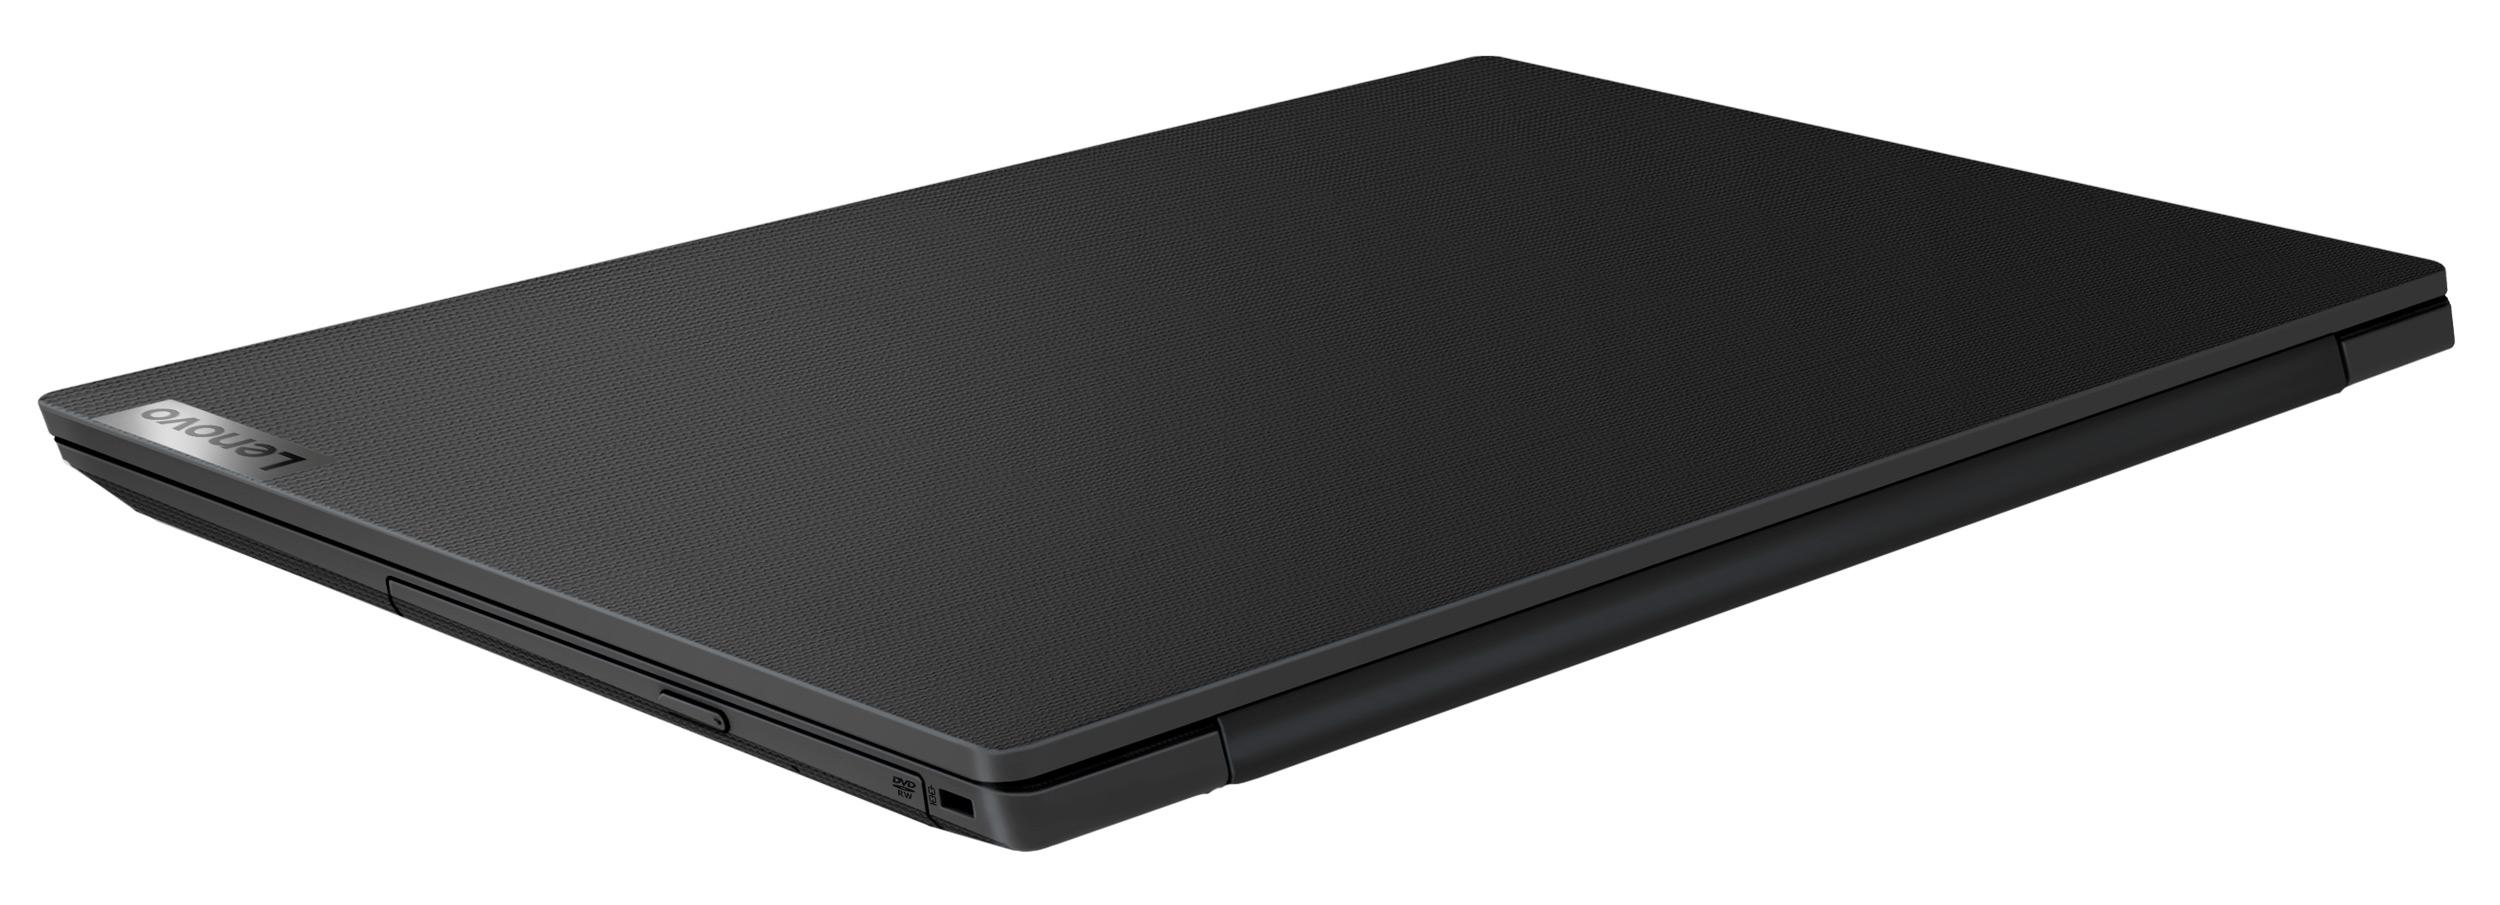 Фото  Ноутбук Lenovo V145-15AST Black  (81MT002BUA)